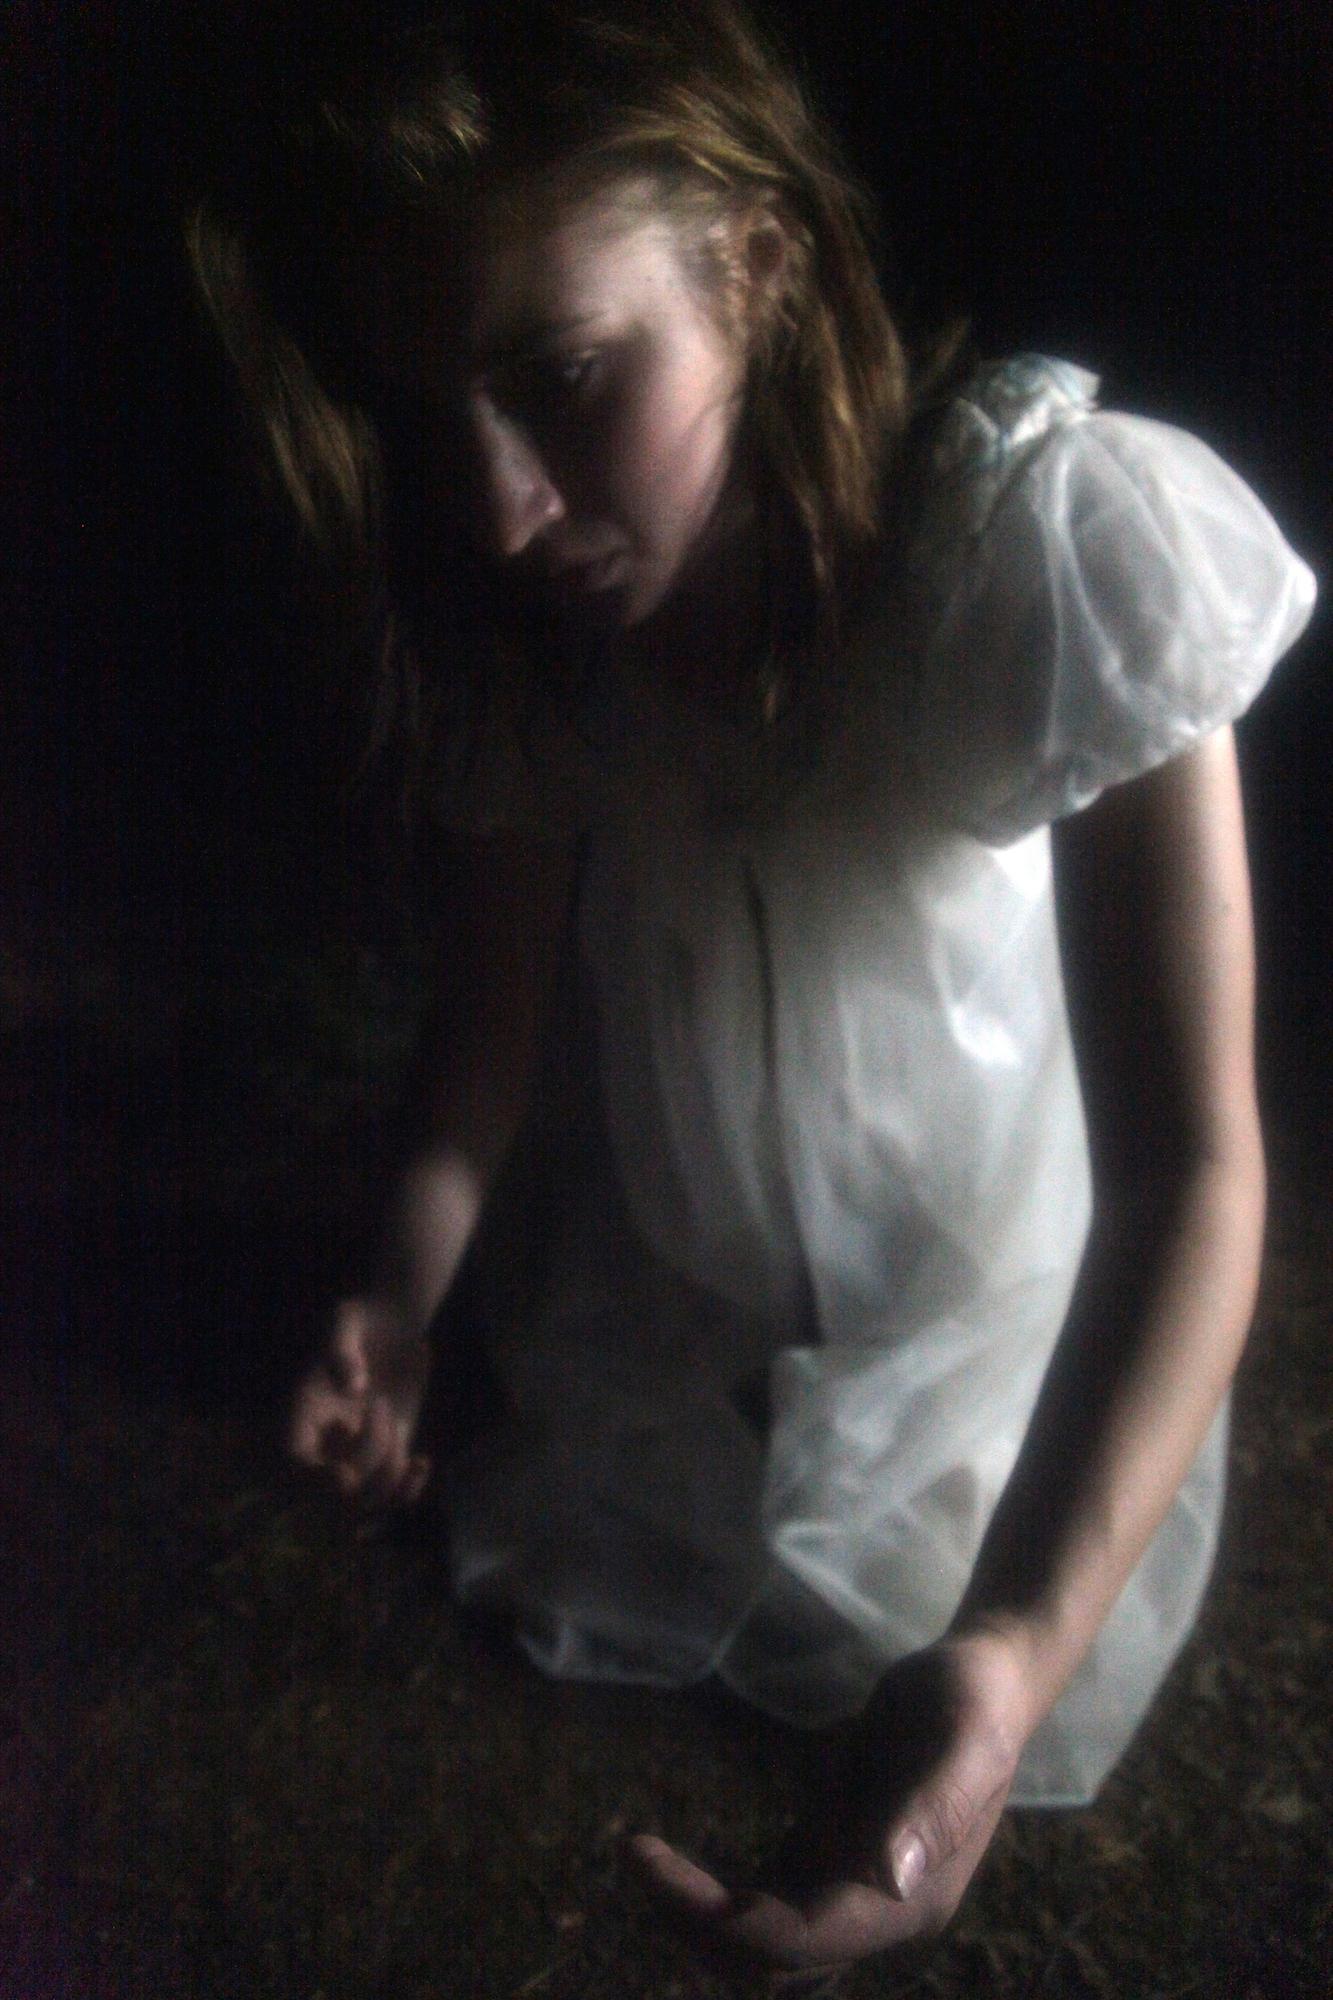 Chelsea Ross Miller behind the scenes for Geena Matuson's (@geenamatuson) experimental psychological thriller 'My Big Bad Wolf' (2013).